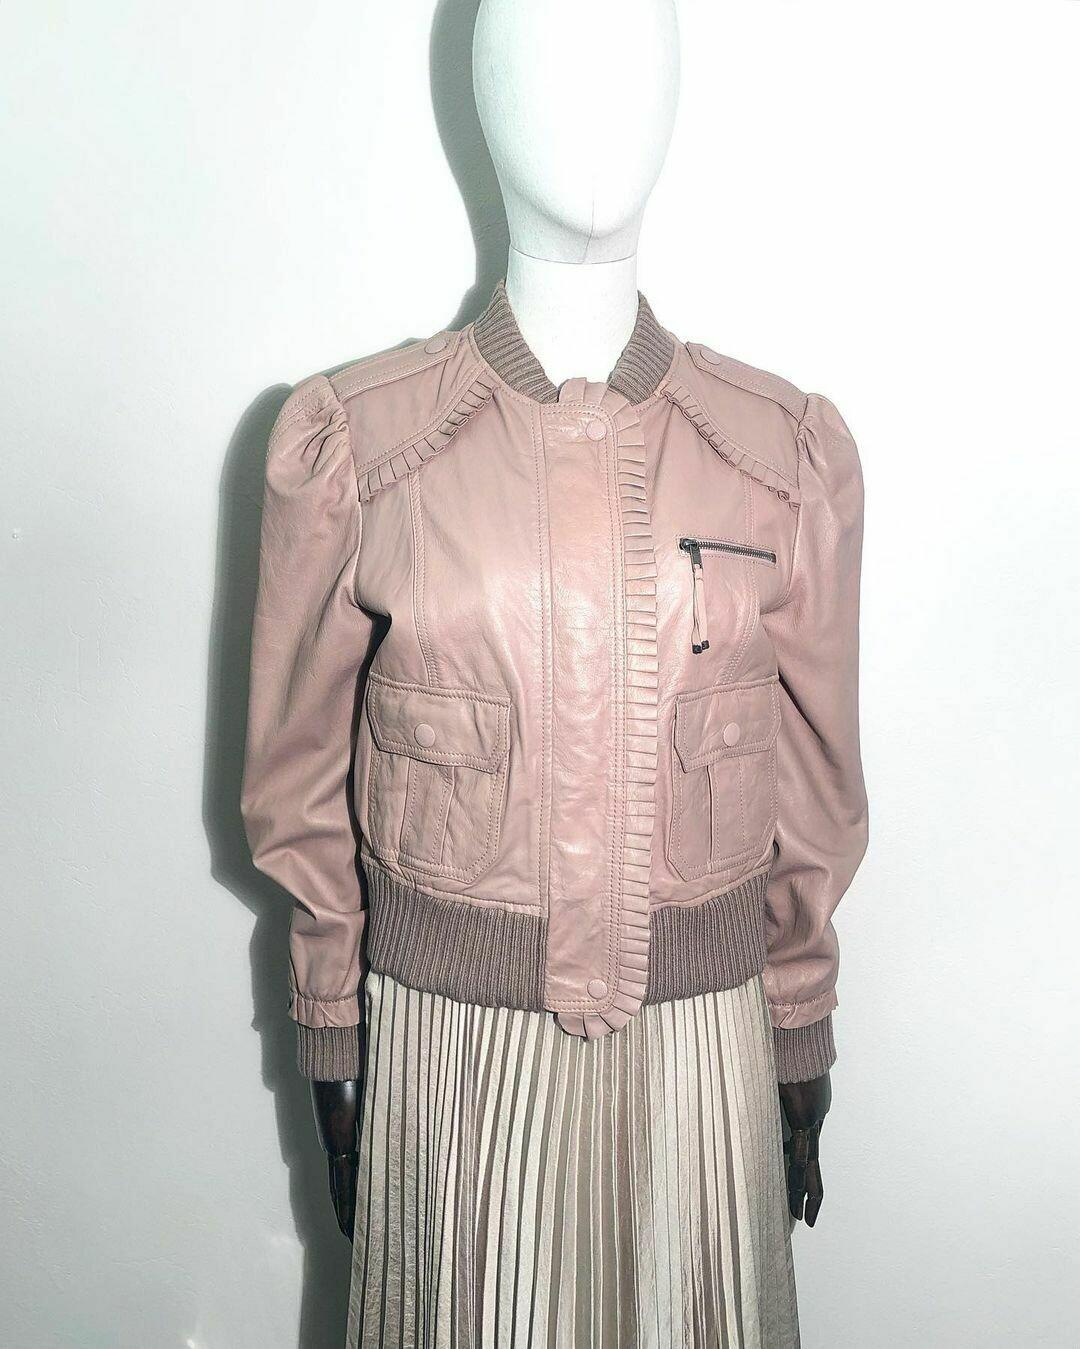 Новая куртка от Juicy Couture